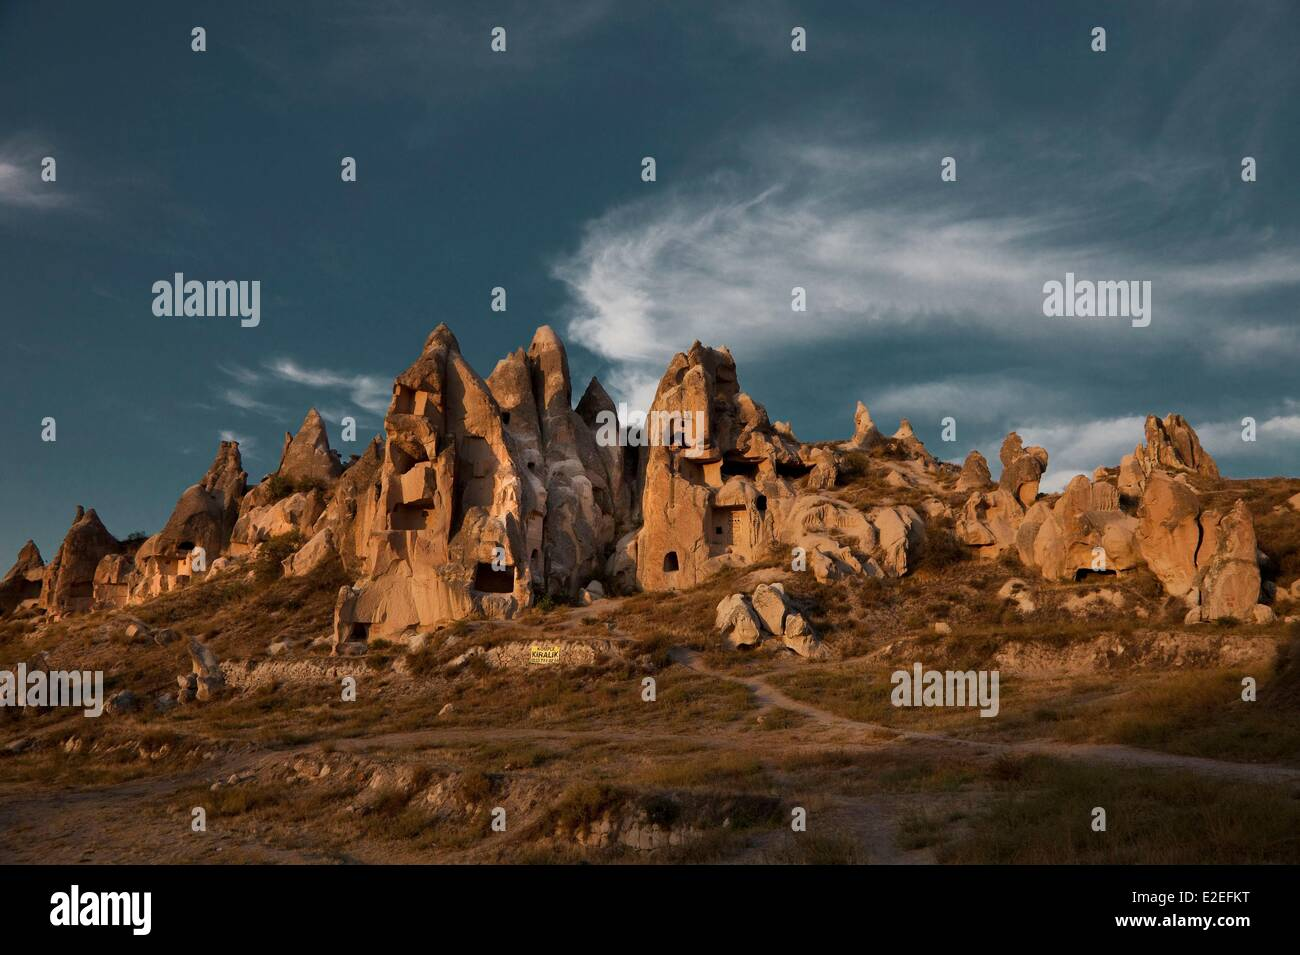 Turkey, Central Anatolia, Capadoccia, Goreme, listed as World Heritage by the UNESCO - Stock Image